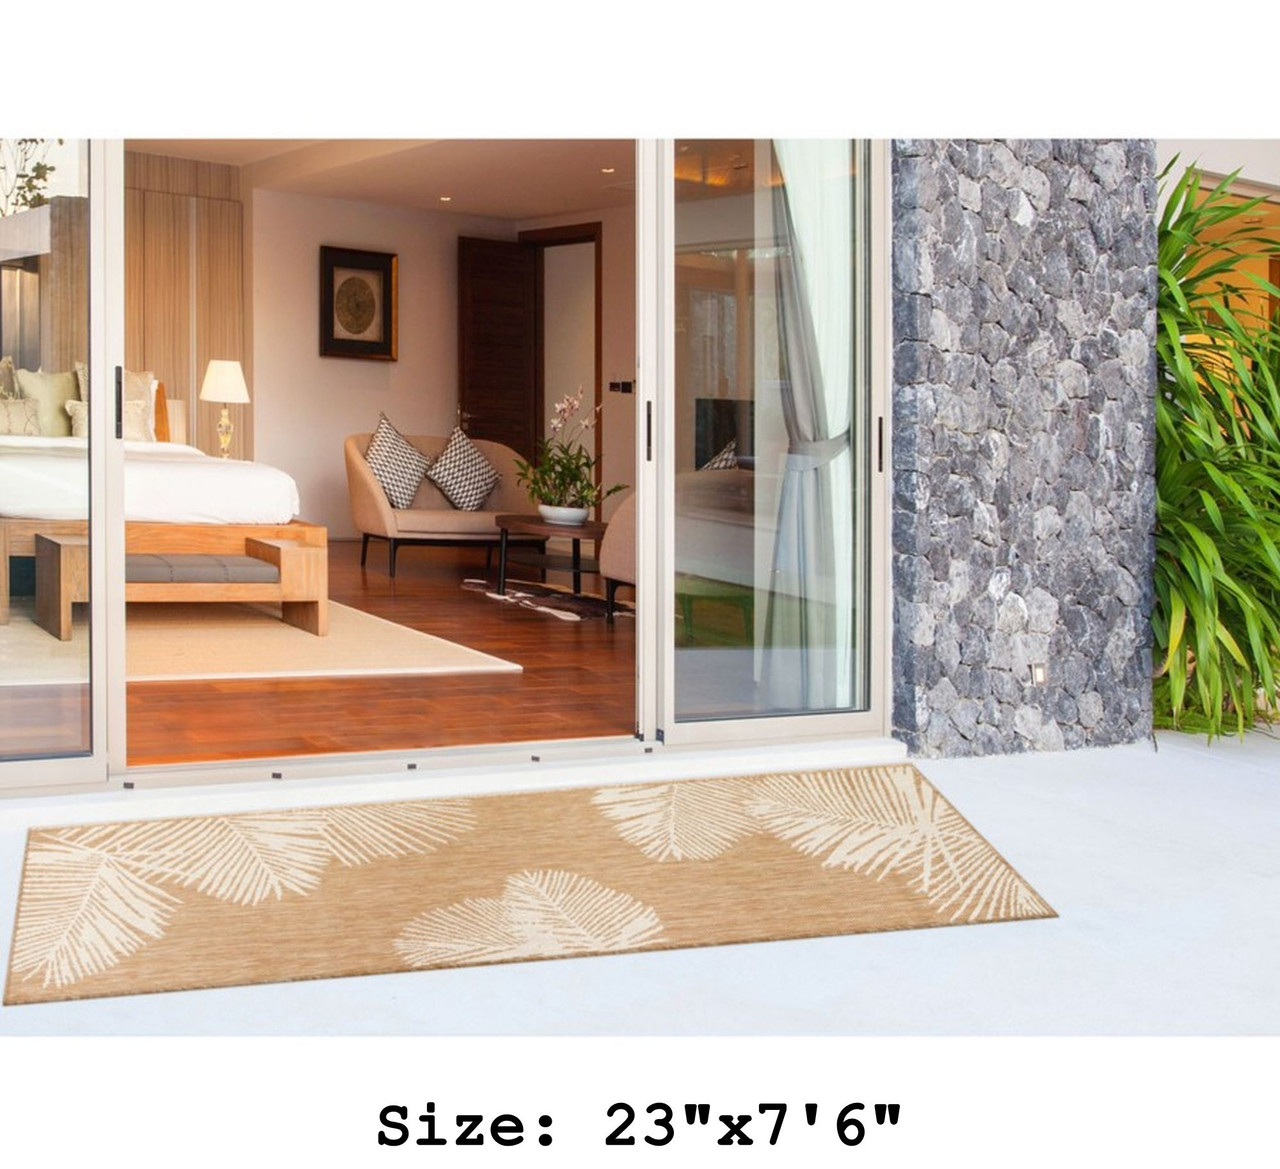 Sand Carmel Palm Leaf Indoor/Outdoor Rug - Runner Lifestyle